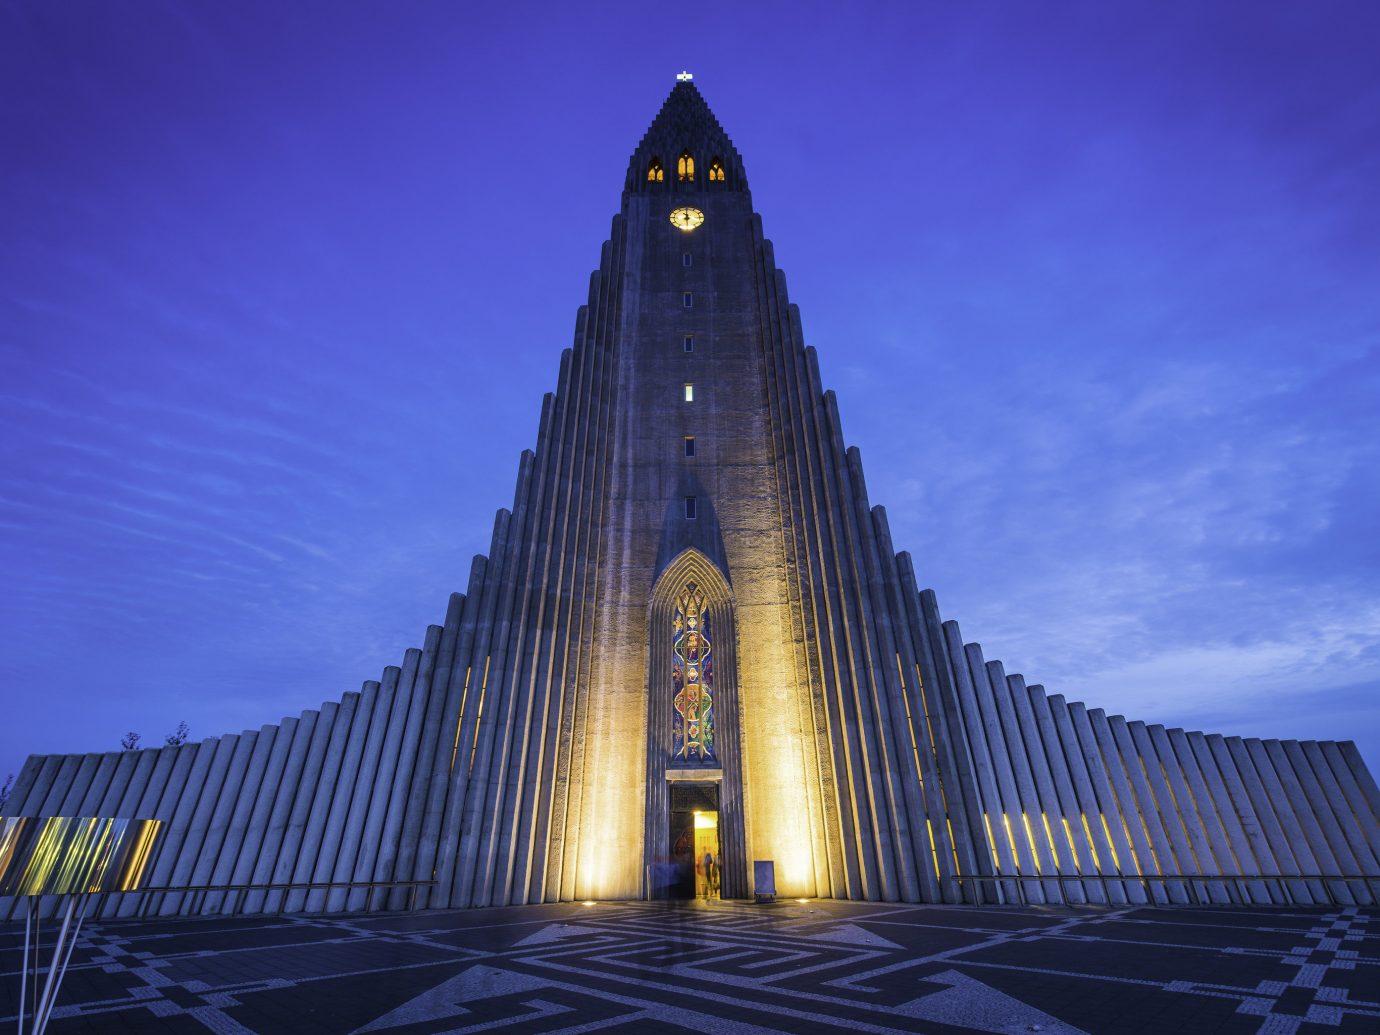 Hallgrimskirkja, Reykjavik, Iceland